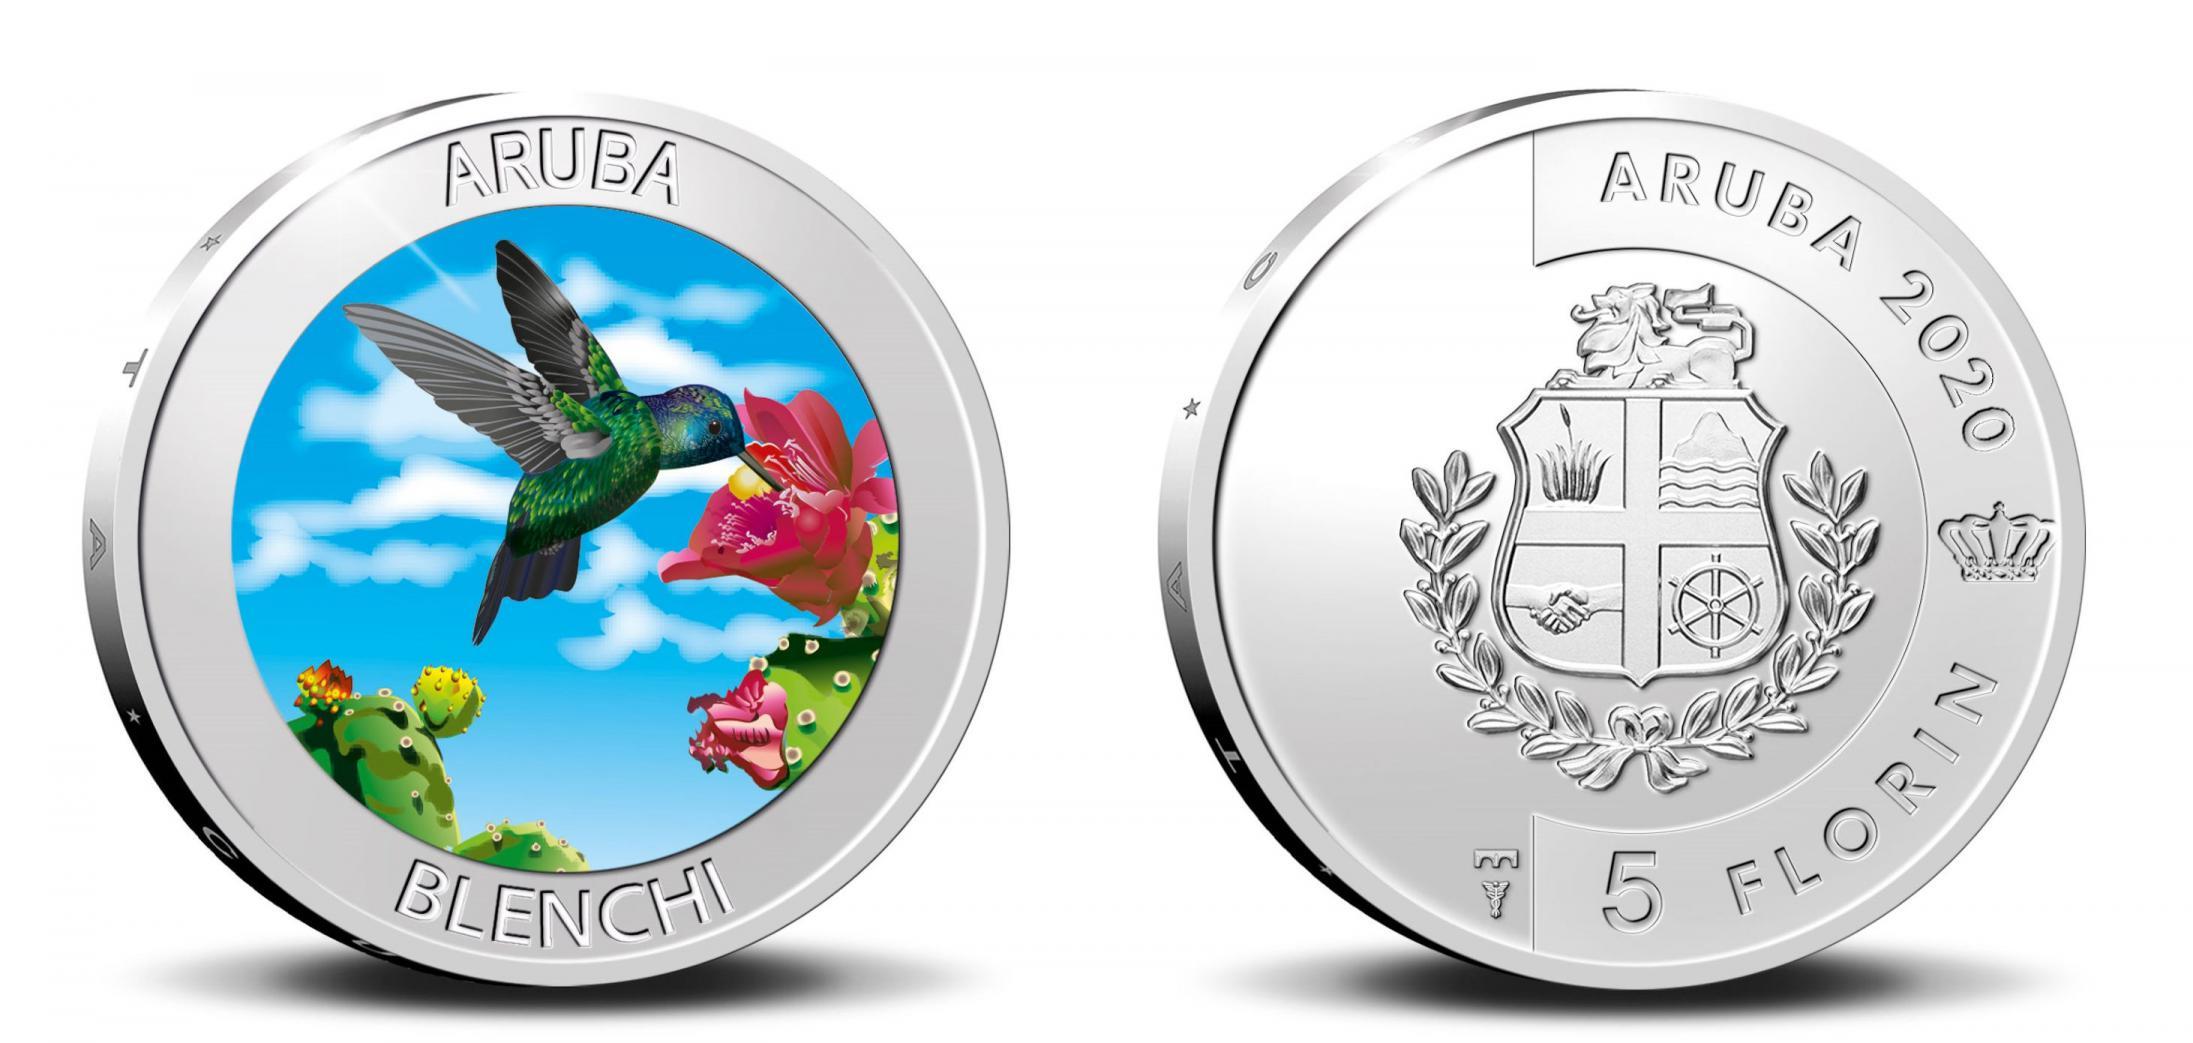 Aruba 5 Florins 2020. The Blenchi. Silver Proof